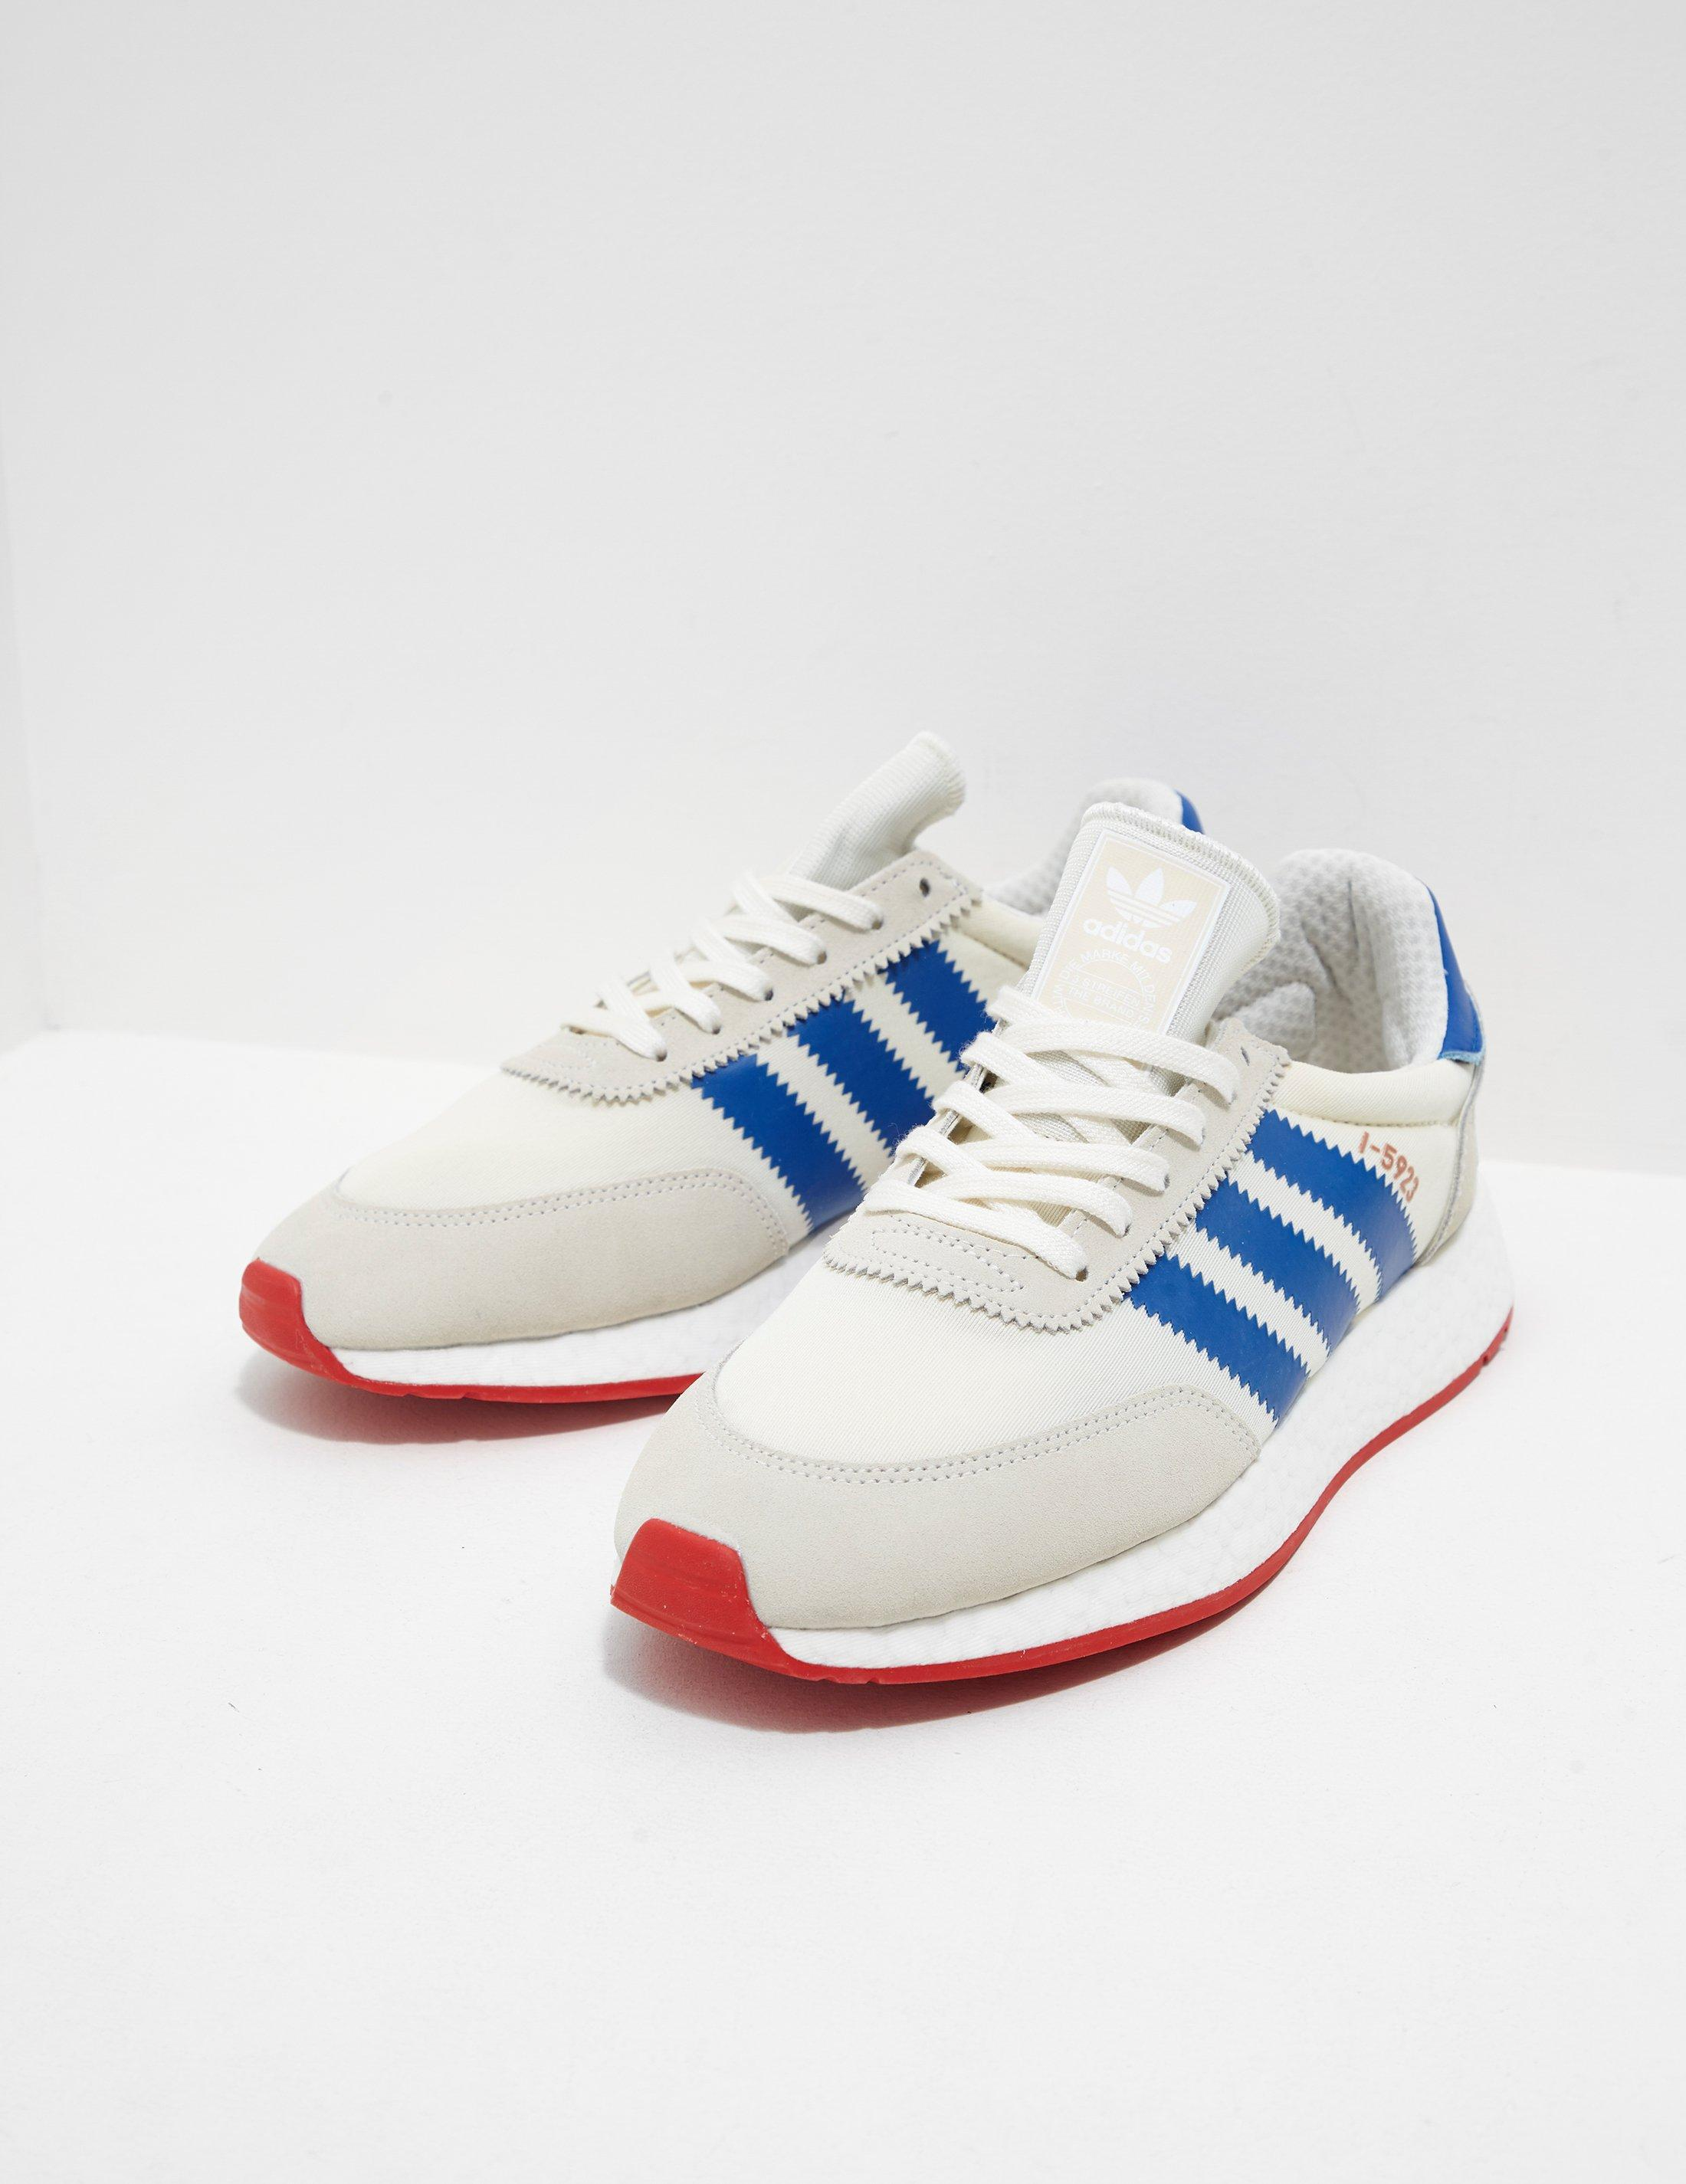 c4c75fba7827 Adidas Originals Mens I-5923 Boost White in White for Men - Lyst